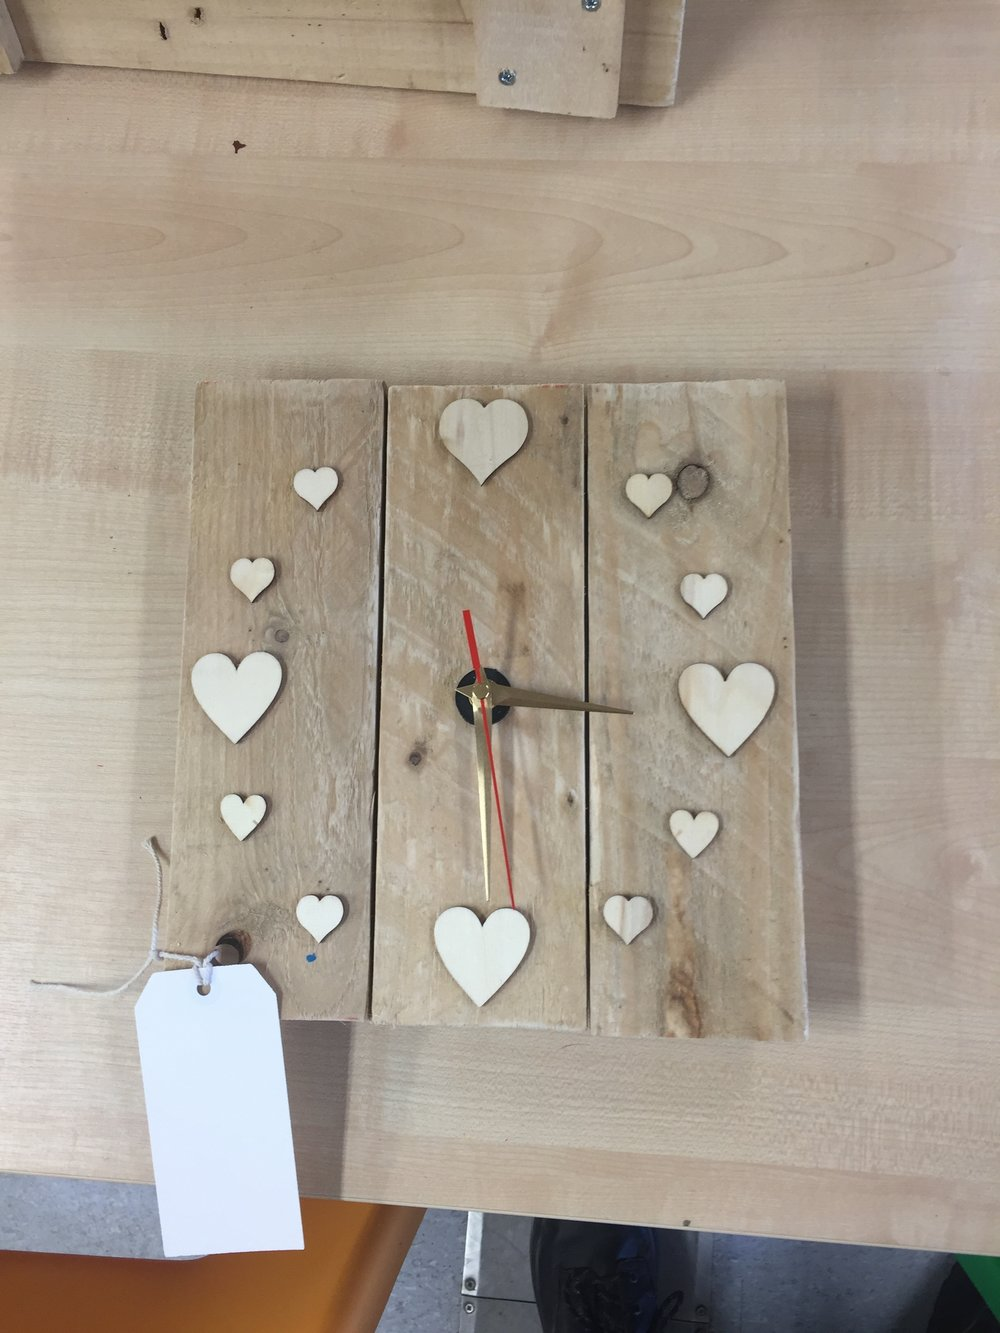 Heart Clock 28x28 cm£15